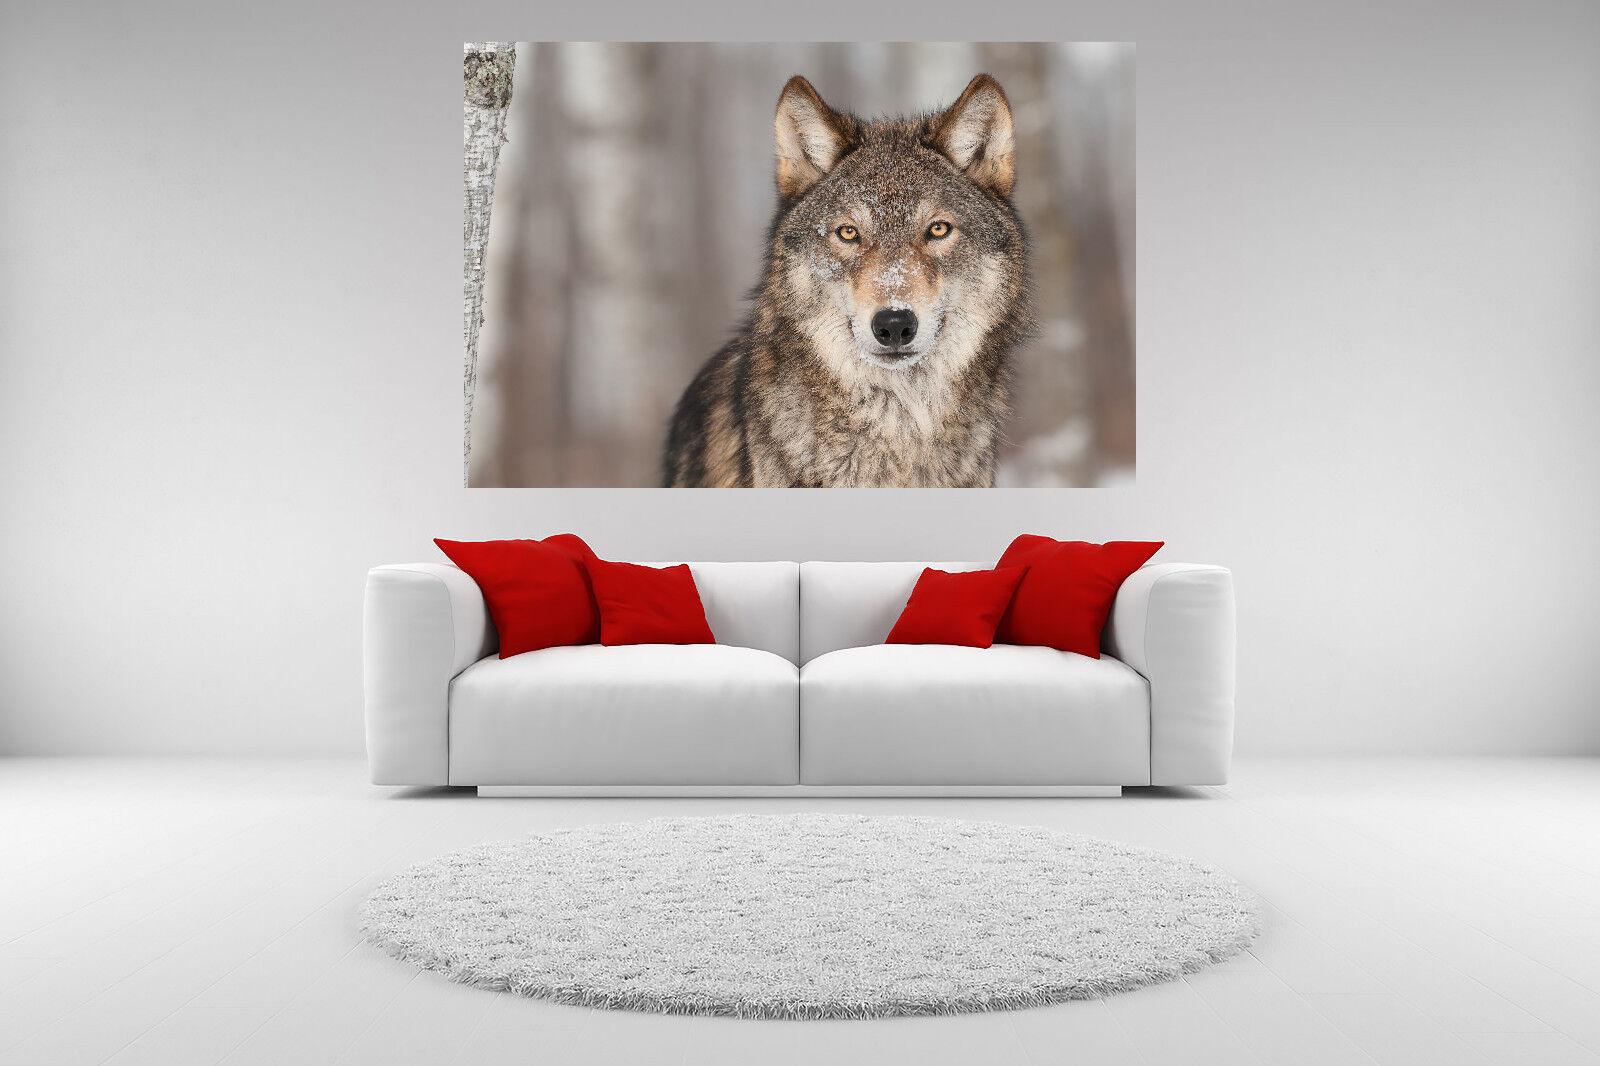 grau Wolf Portrait Canvas Picture Giclee Print Unframed Home Decor Wall Art